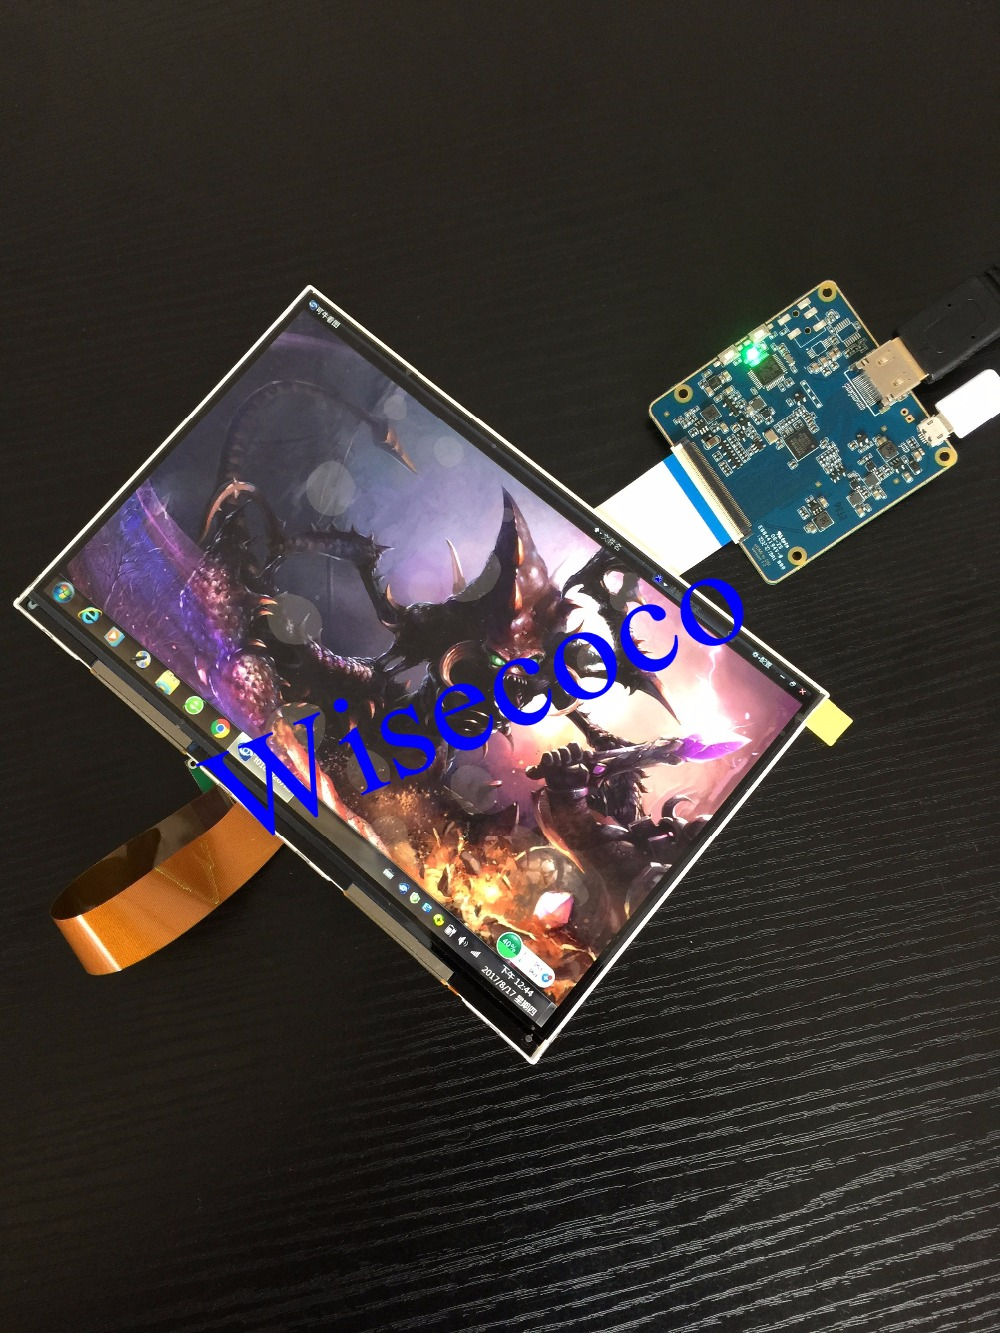 HDMI-MIPI Wisecoco совместимый Raspberry 3